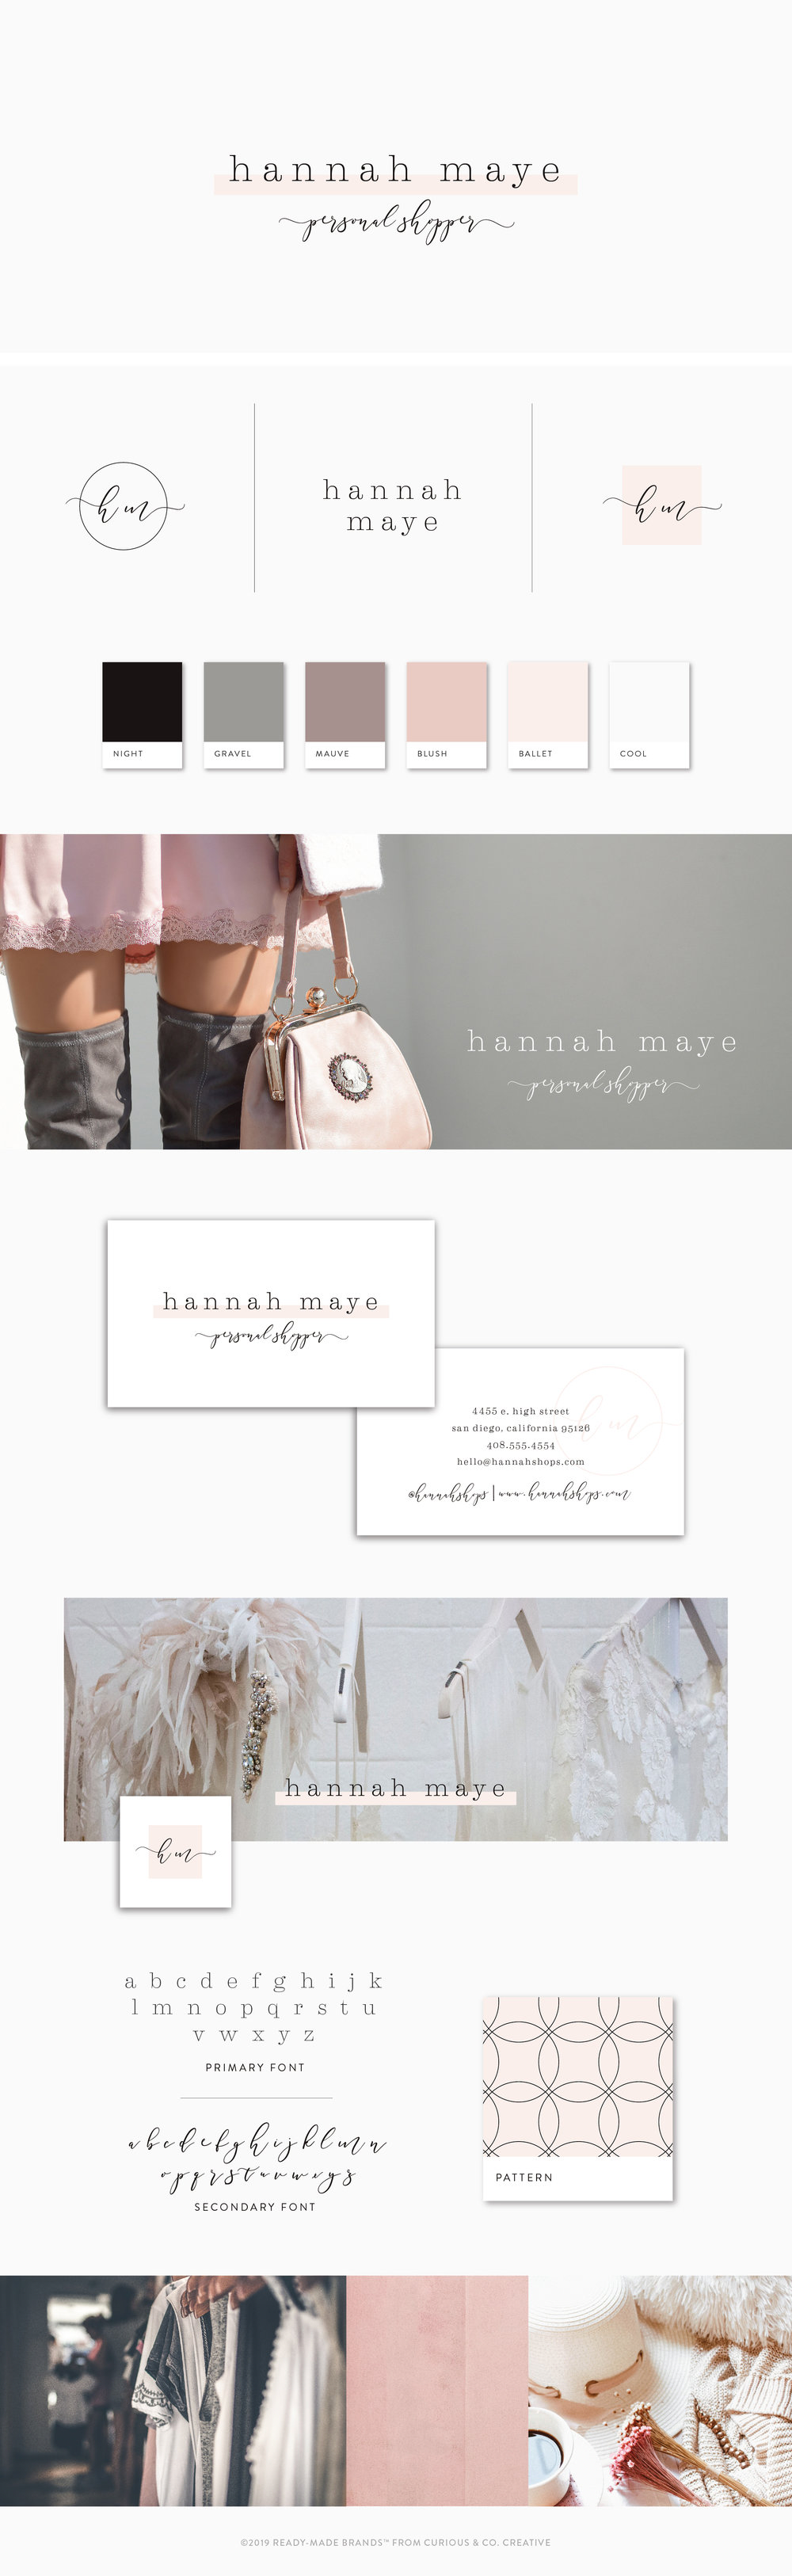 Brand Board Hannah Maye | Ready-Made from Curious & Co. Creative